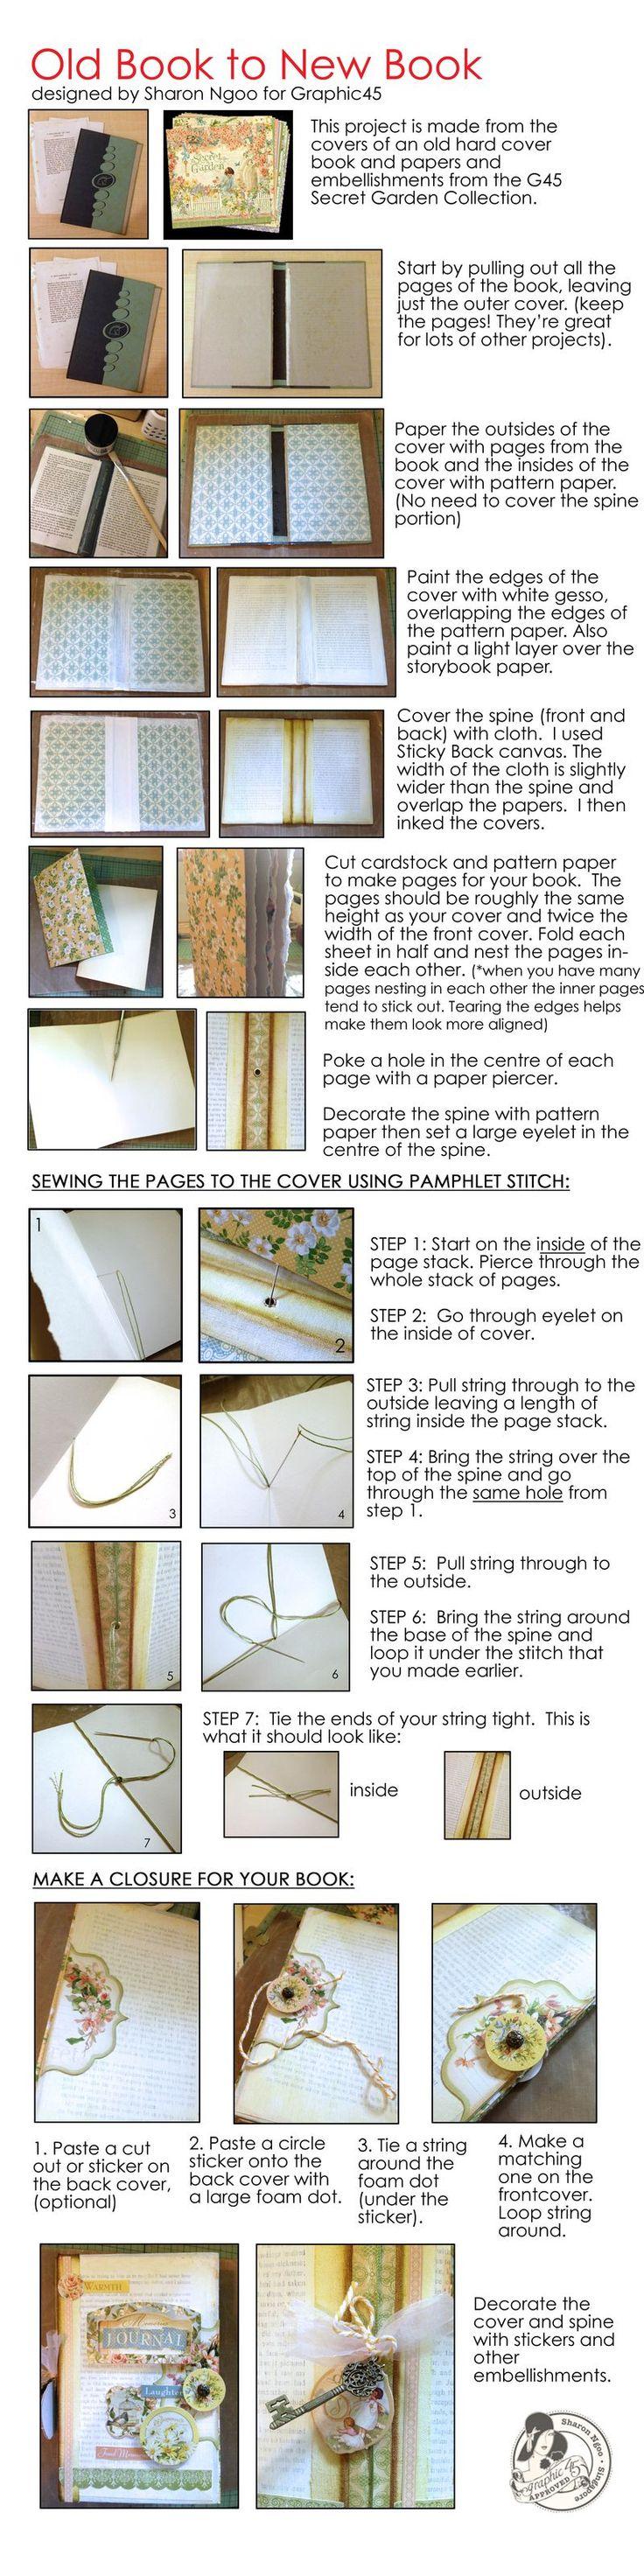 Graphic45 Sharon Ngoo Secret Garden Journal Tutorial. Turn an old book into a new book! #graphic45 #DIY #Tutorials